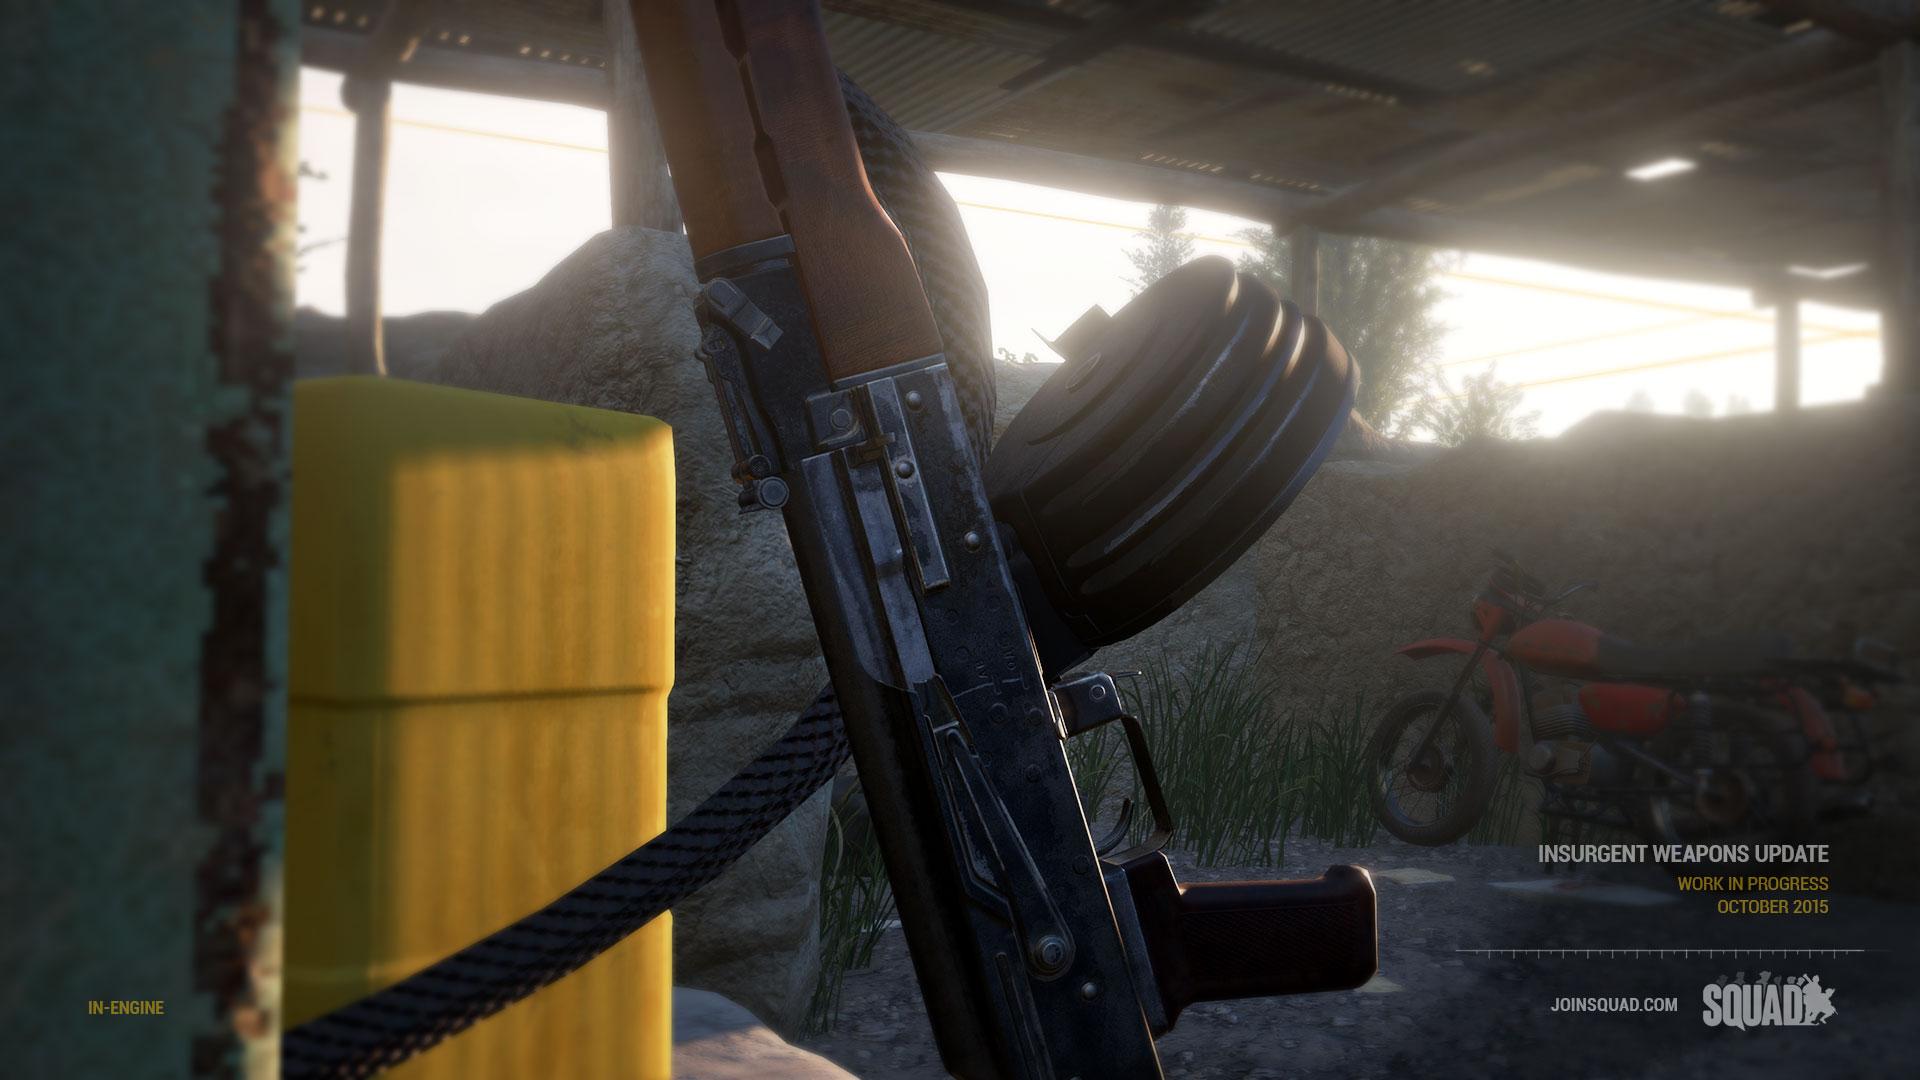 new_insweapons_3.jpg